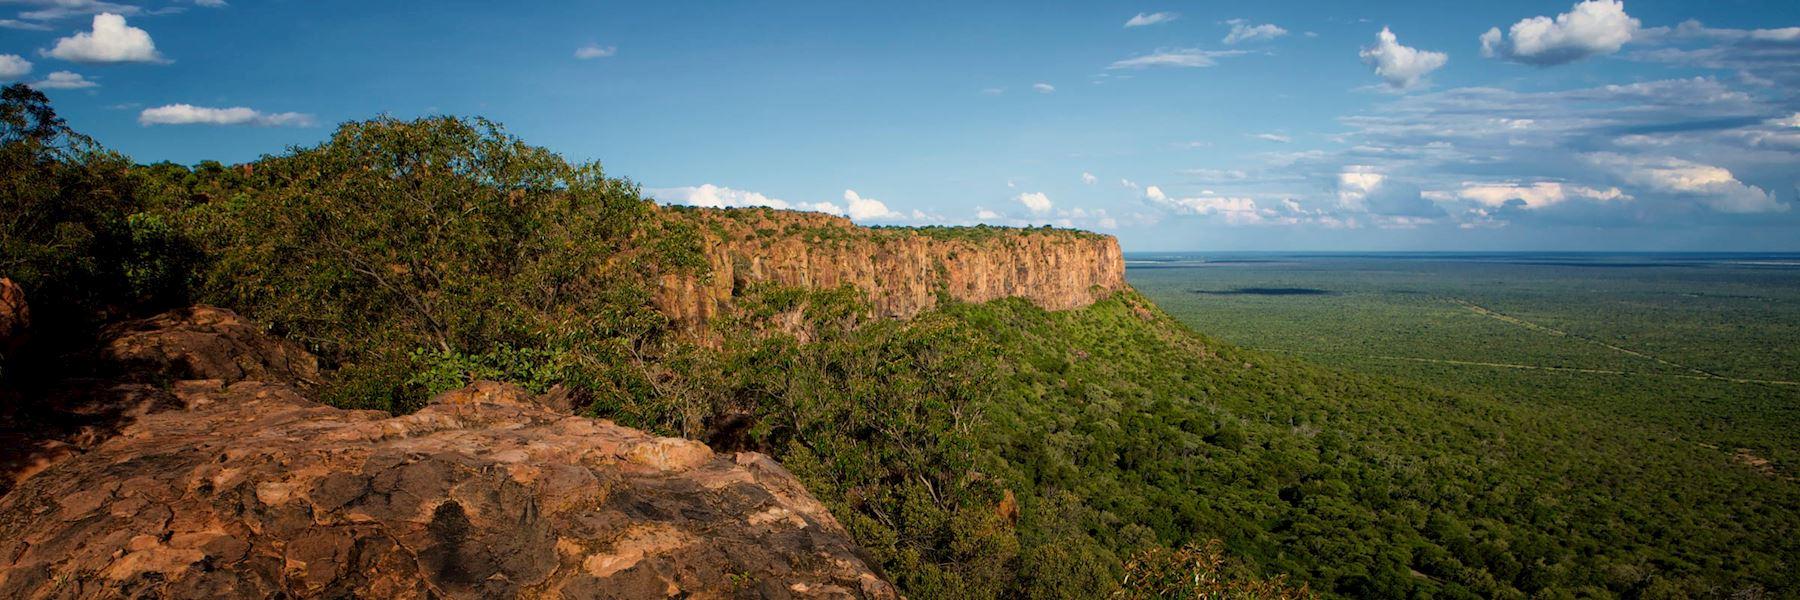 Visit Waterberg Plateau, Namibia